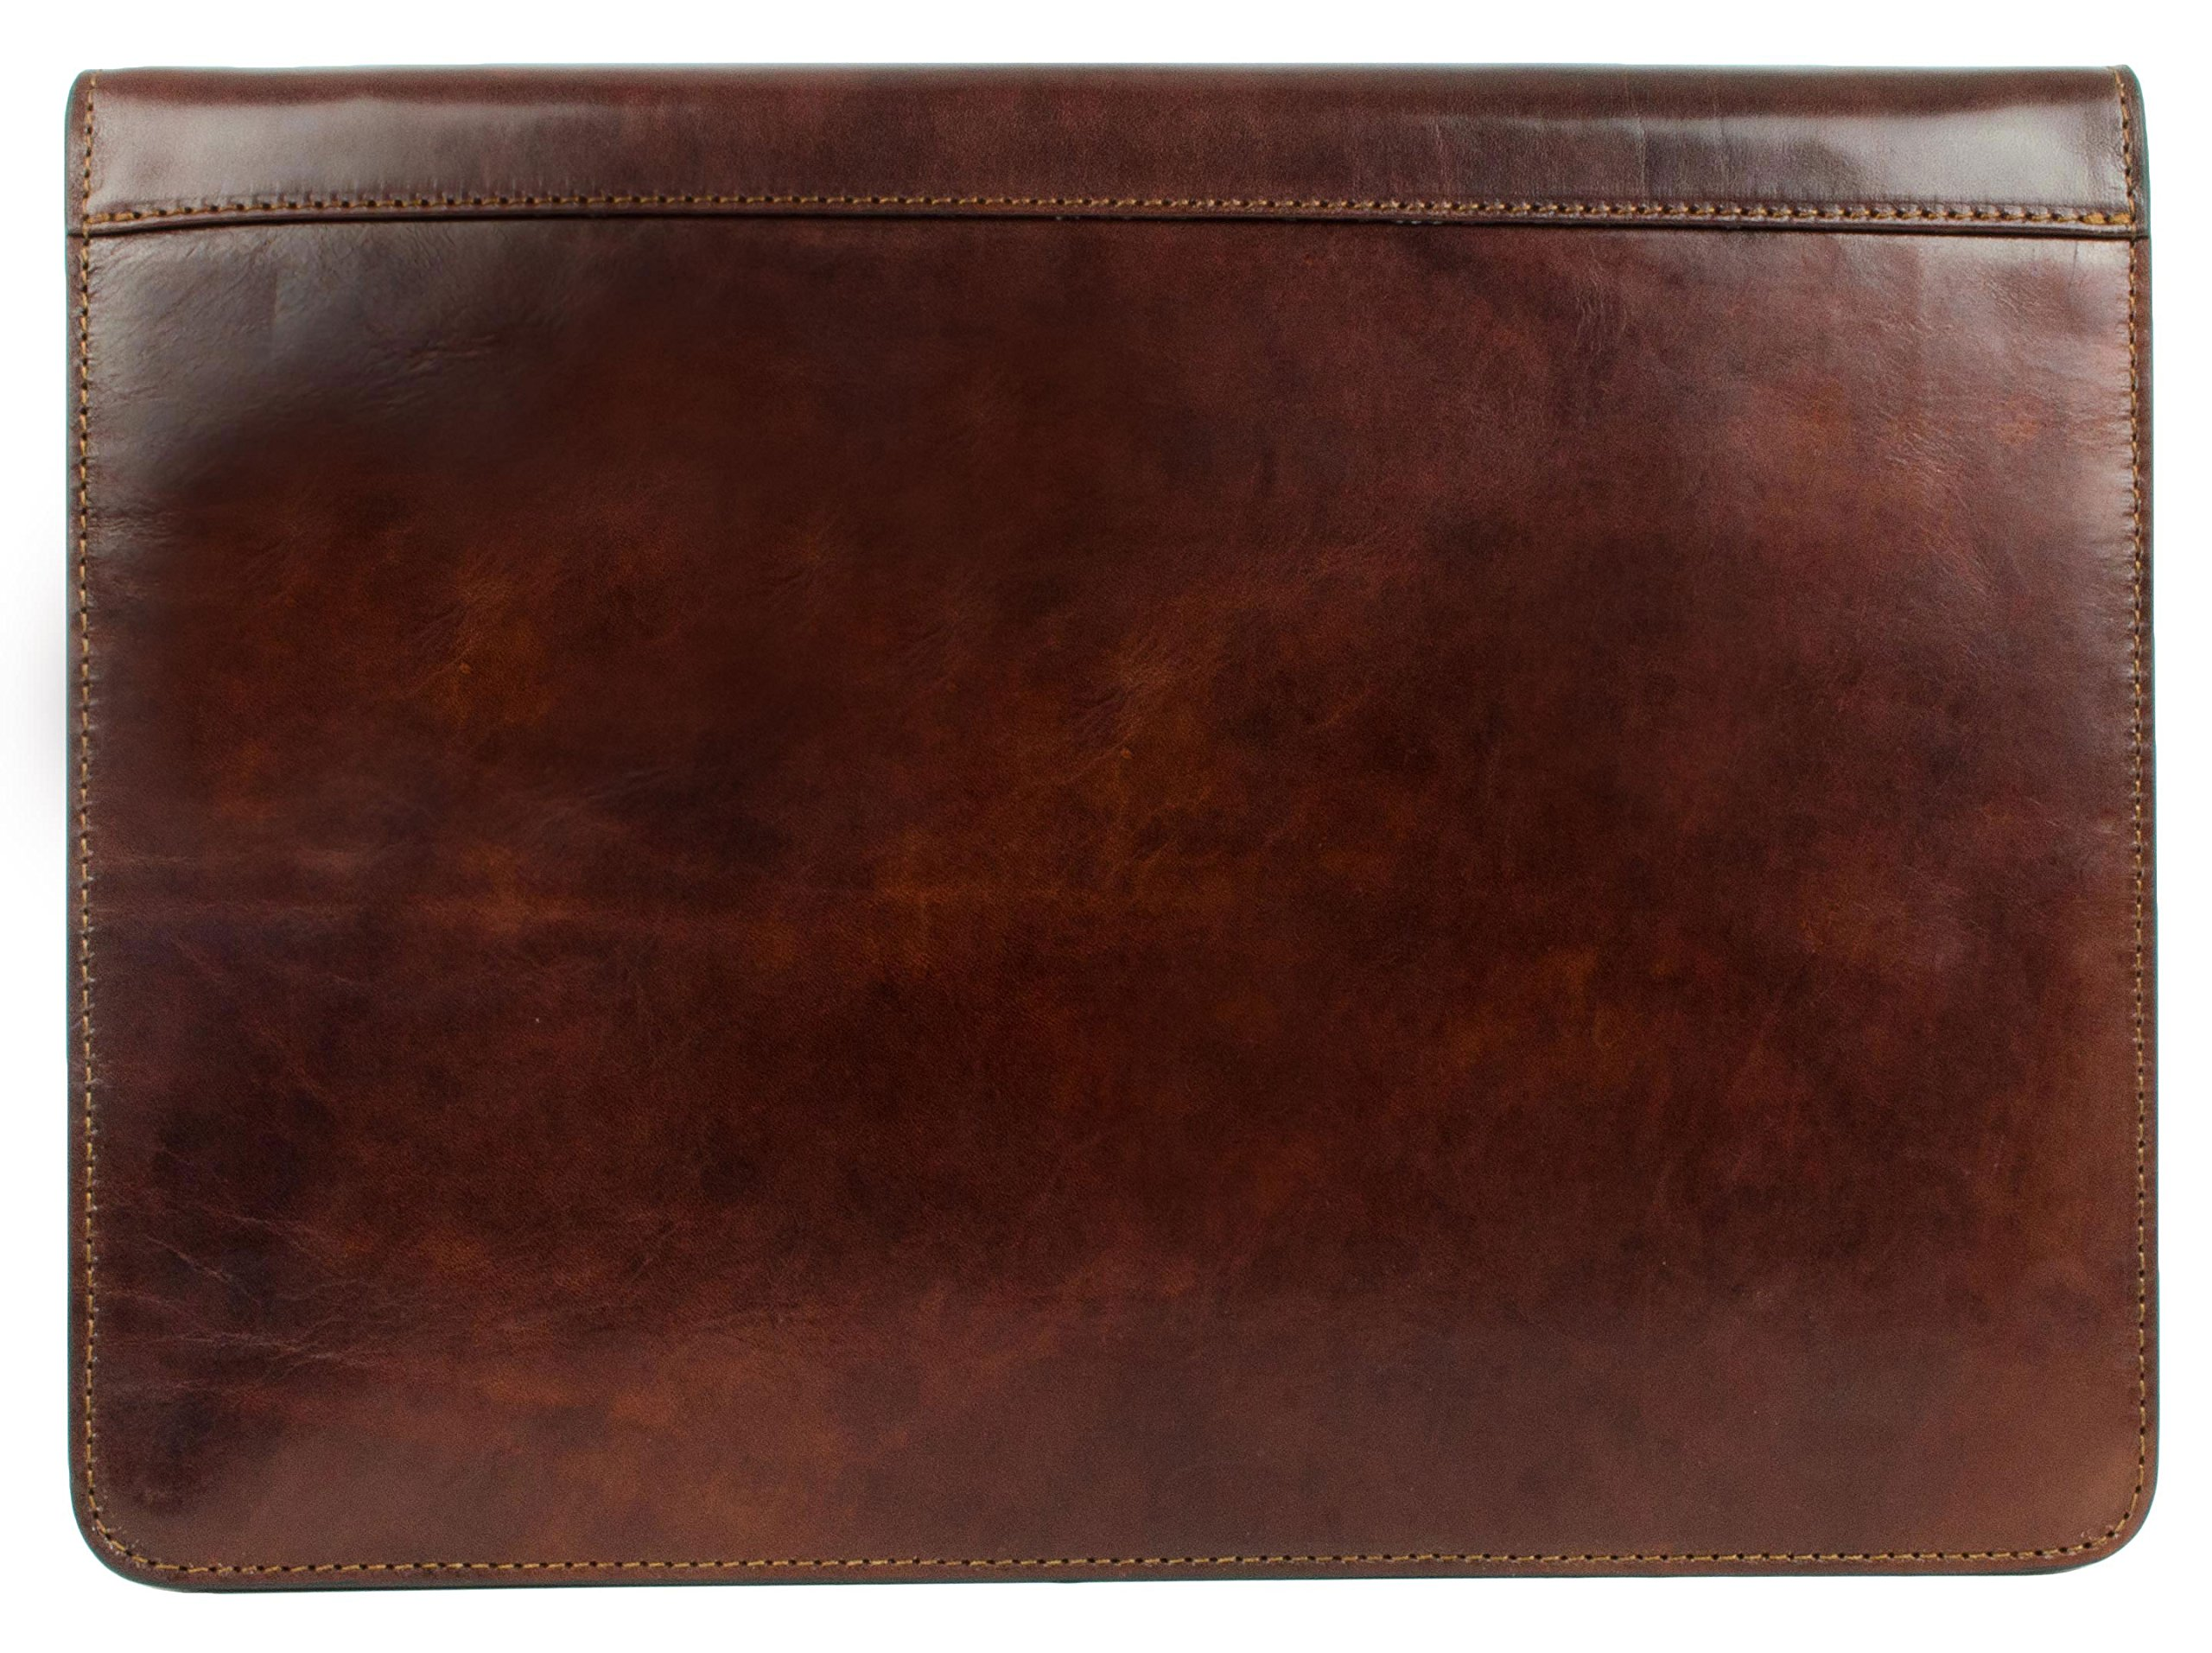 Leather Portfolio Document Folder Handcrafted Case Dark Brown Time Resistance